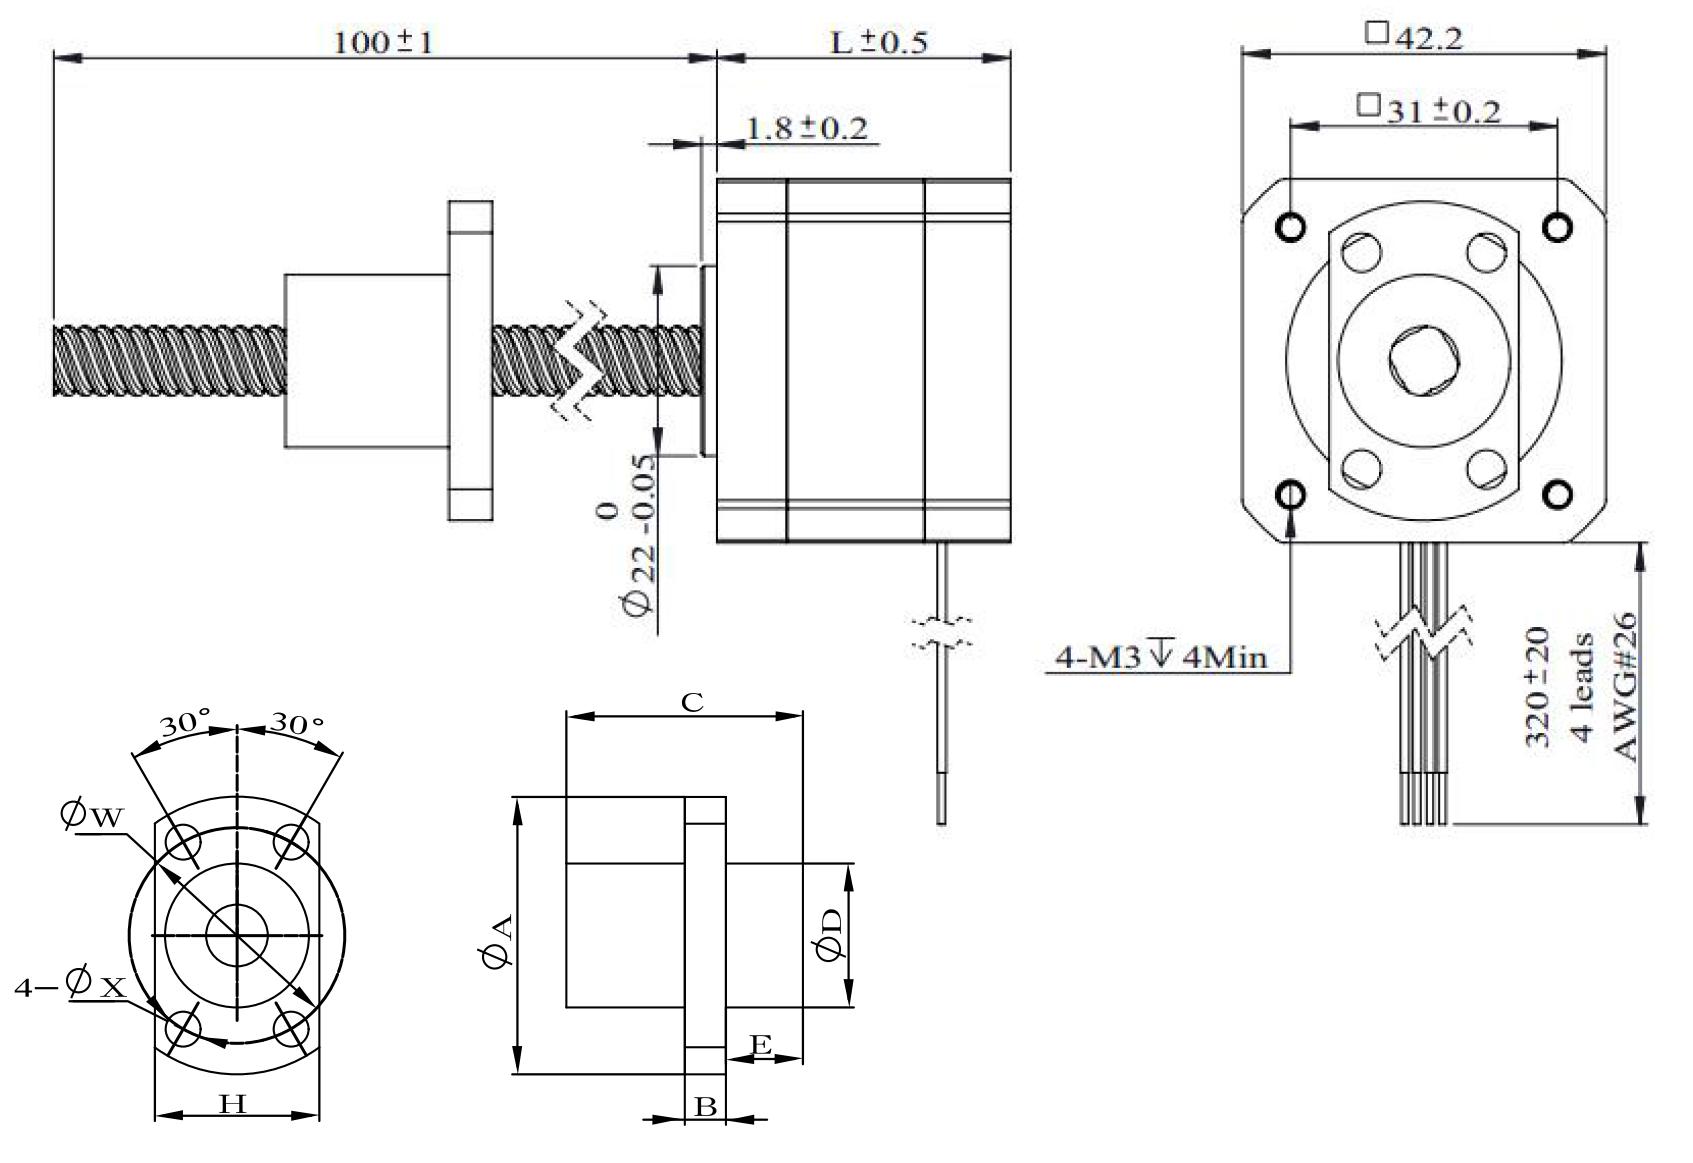 NEMA 17 Ball Screw Actuator Drawing